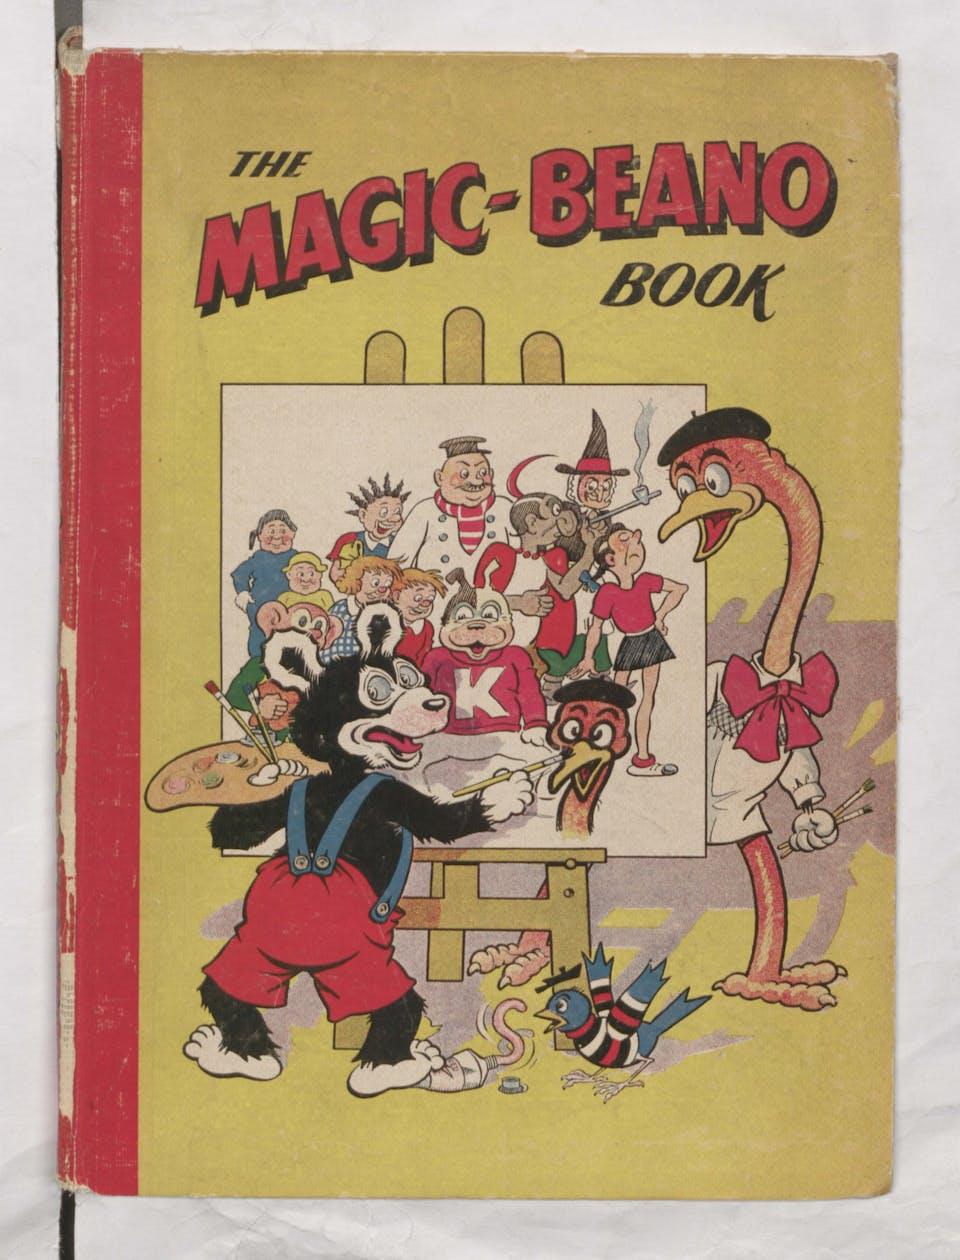 1950 Magic-Beano Book